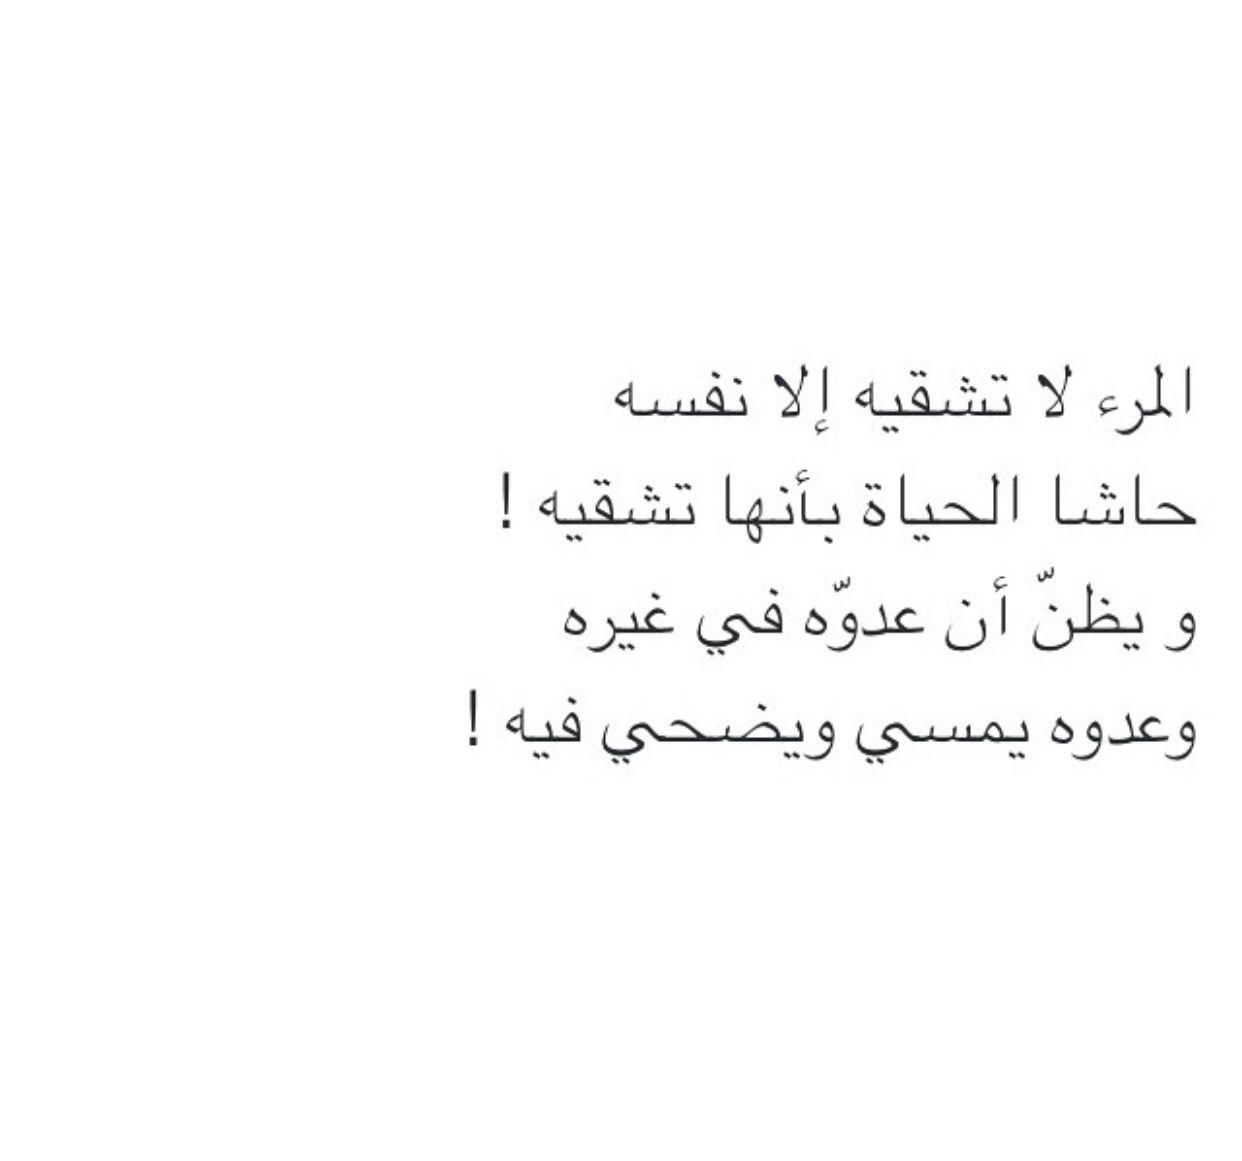 عبدالله البردوني Words Arabic Calligraphy Calligraphy